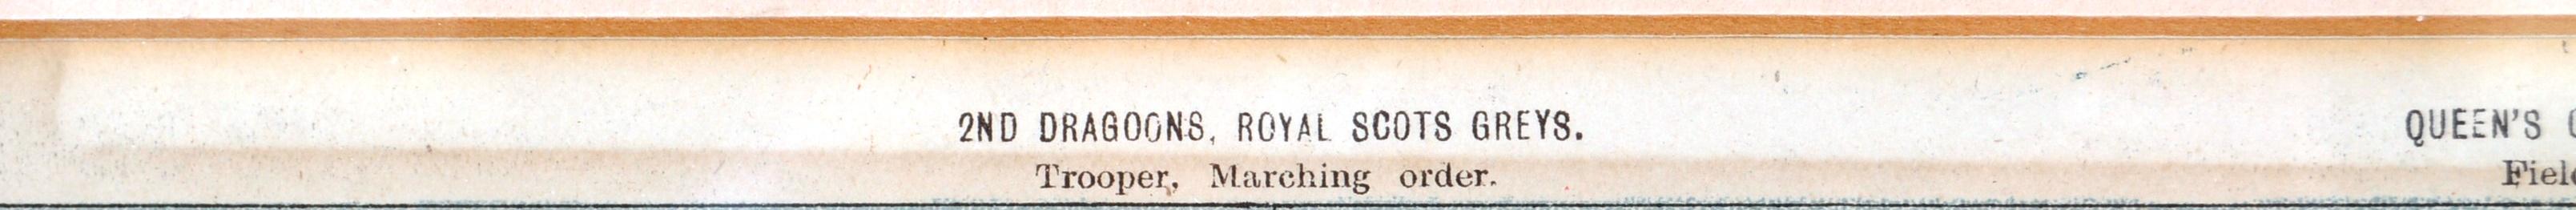 RICHARD SIMKIN - THE SCOTTISH REGIMENTS OF THE BRITISH ARMY - Image 3 of 7